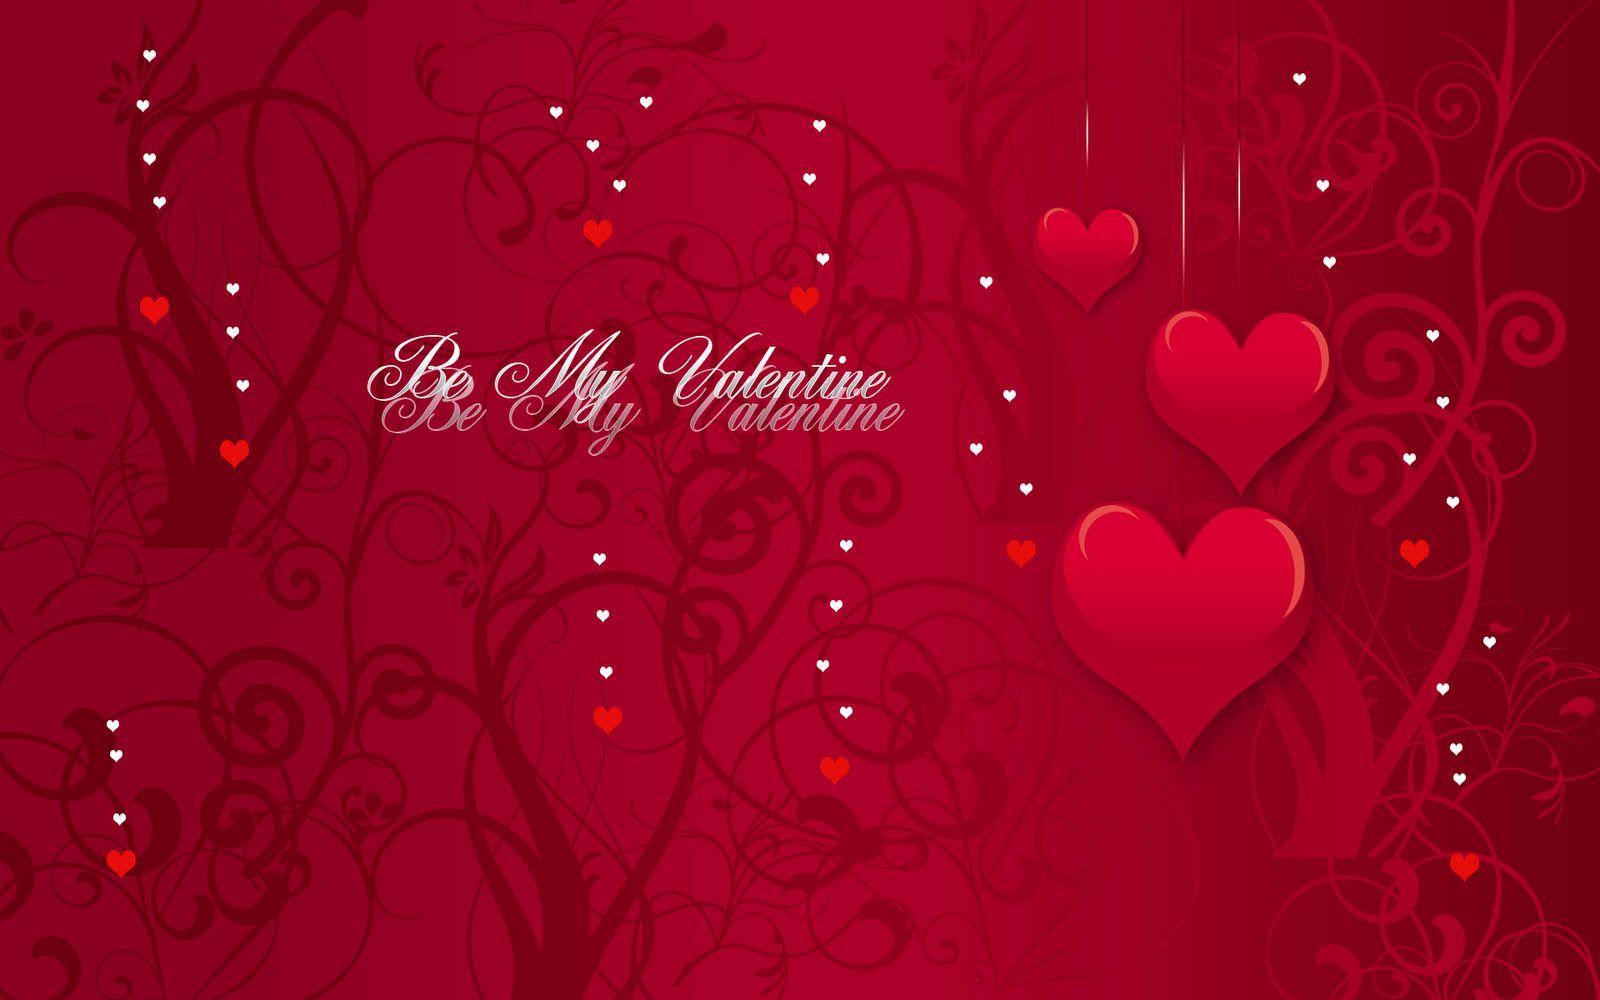 valentines day desktop wallpapers - wallpaper cave